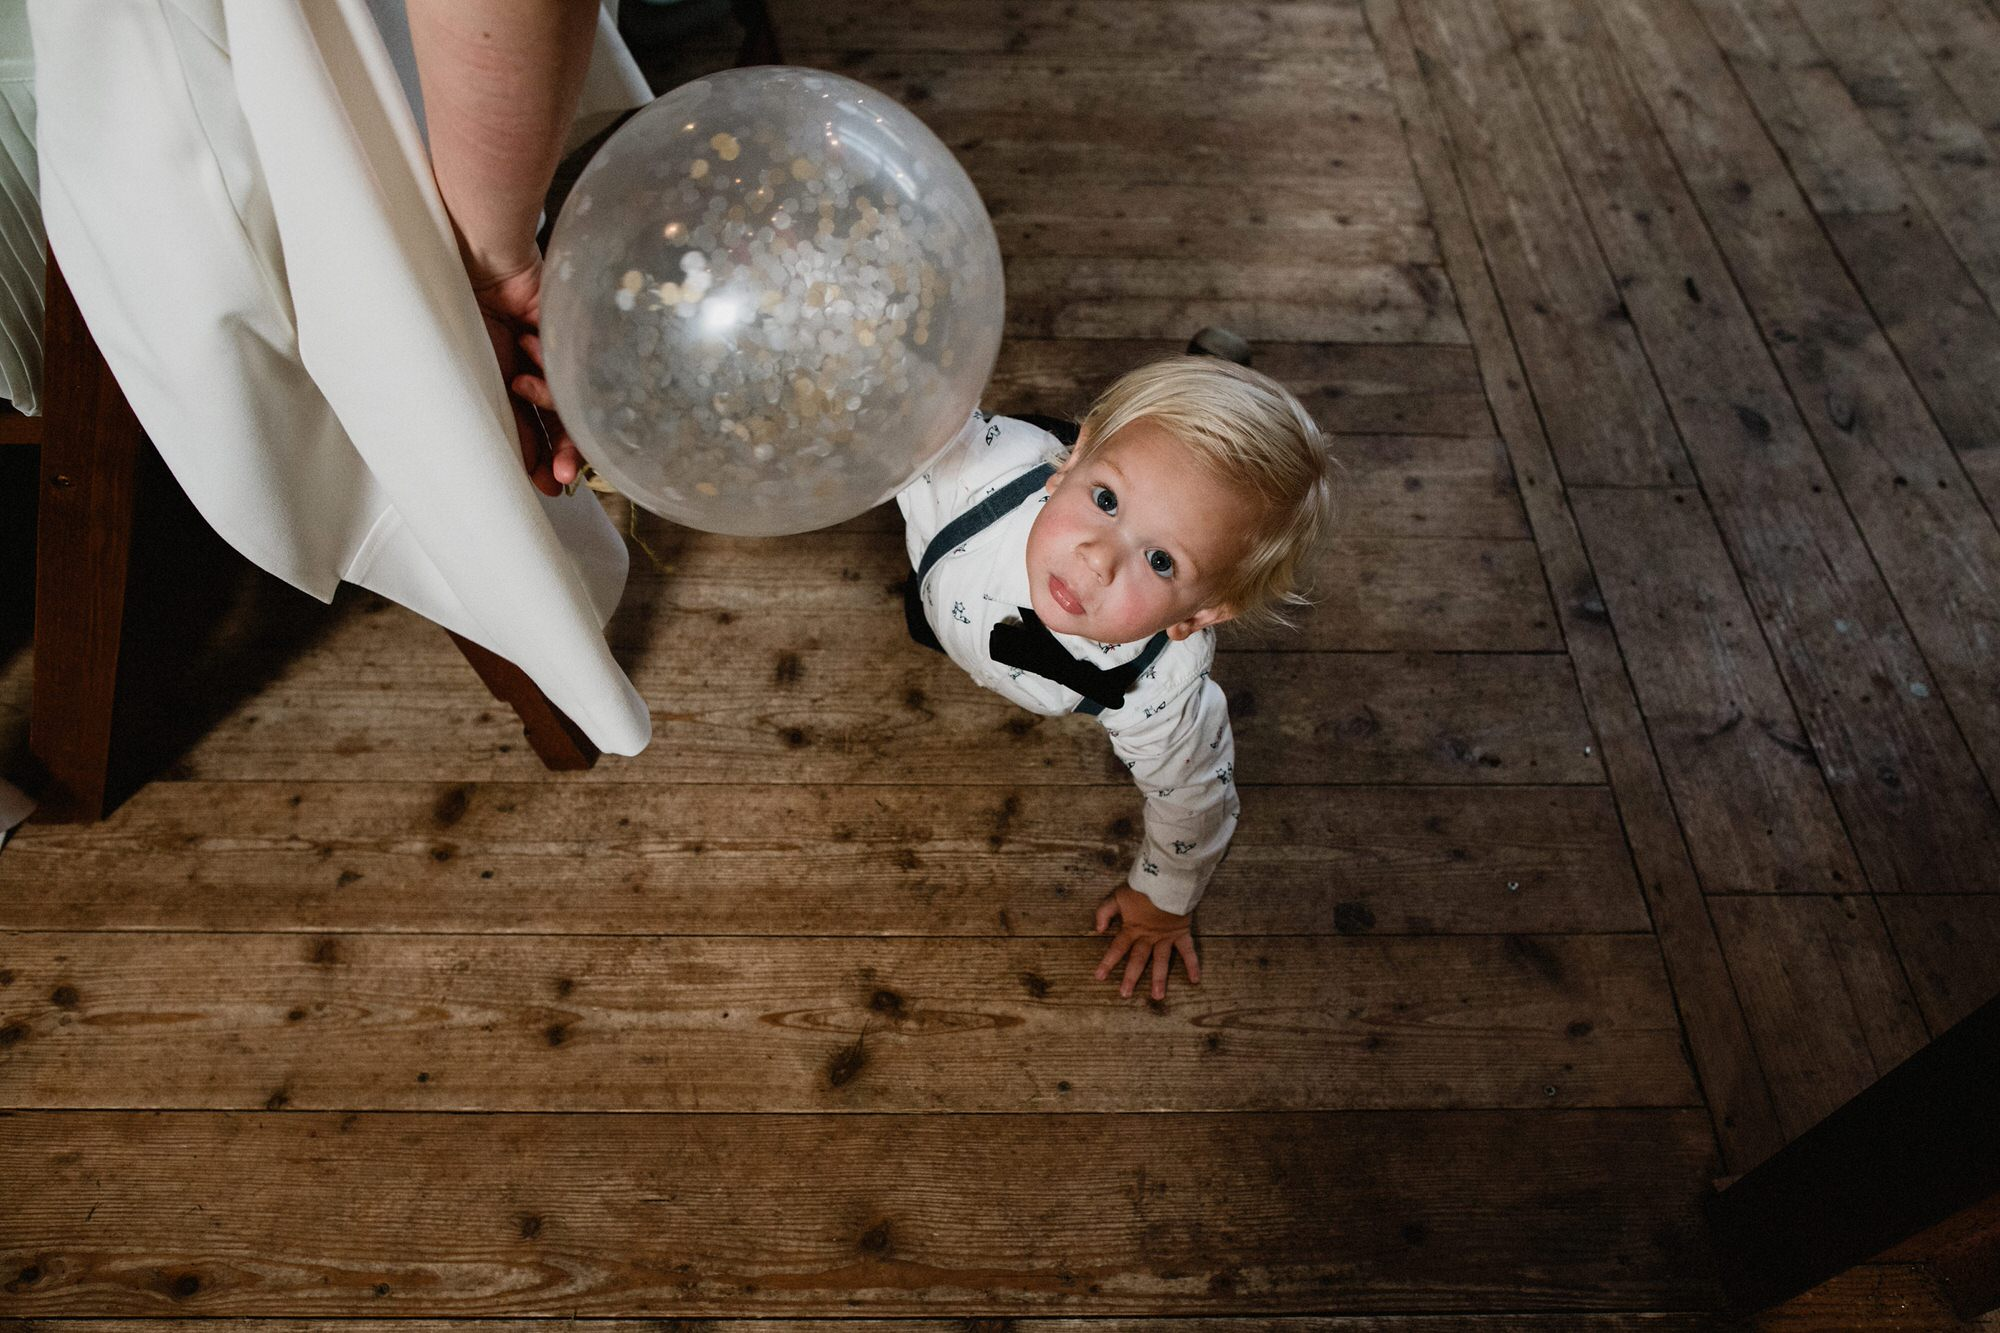 058 TIN SHED KNOCKRAICH WEDDING AUTUMN ZOE ALEXANDRA PHOTOGRAPHY